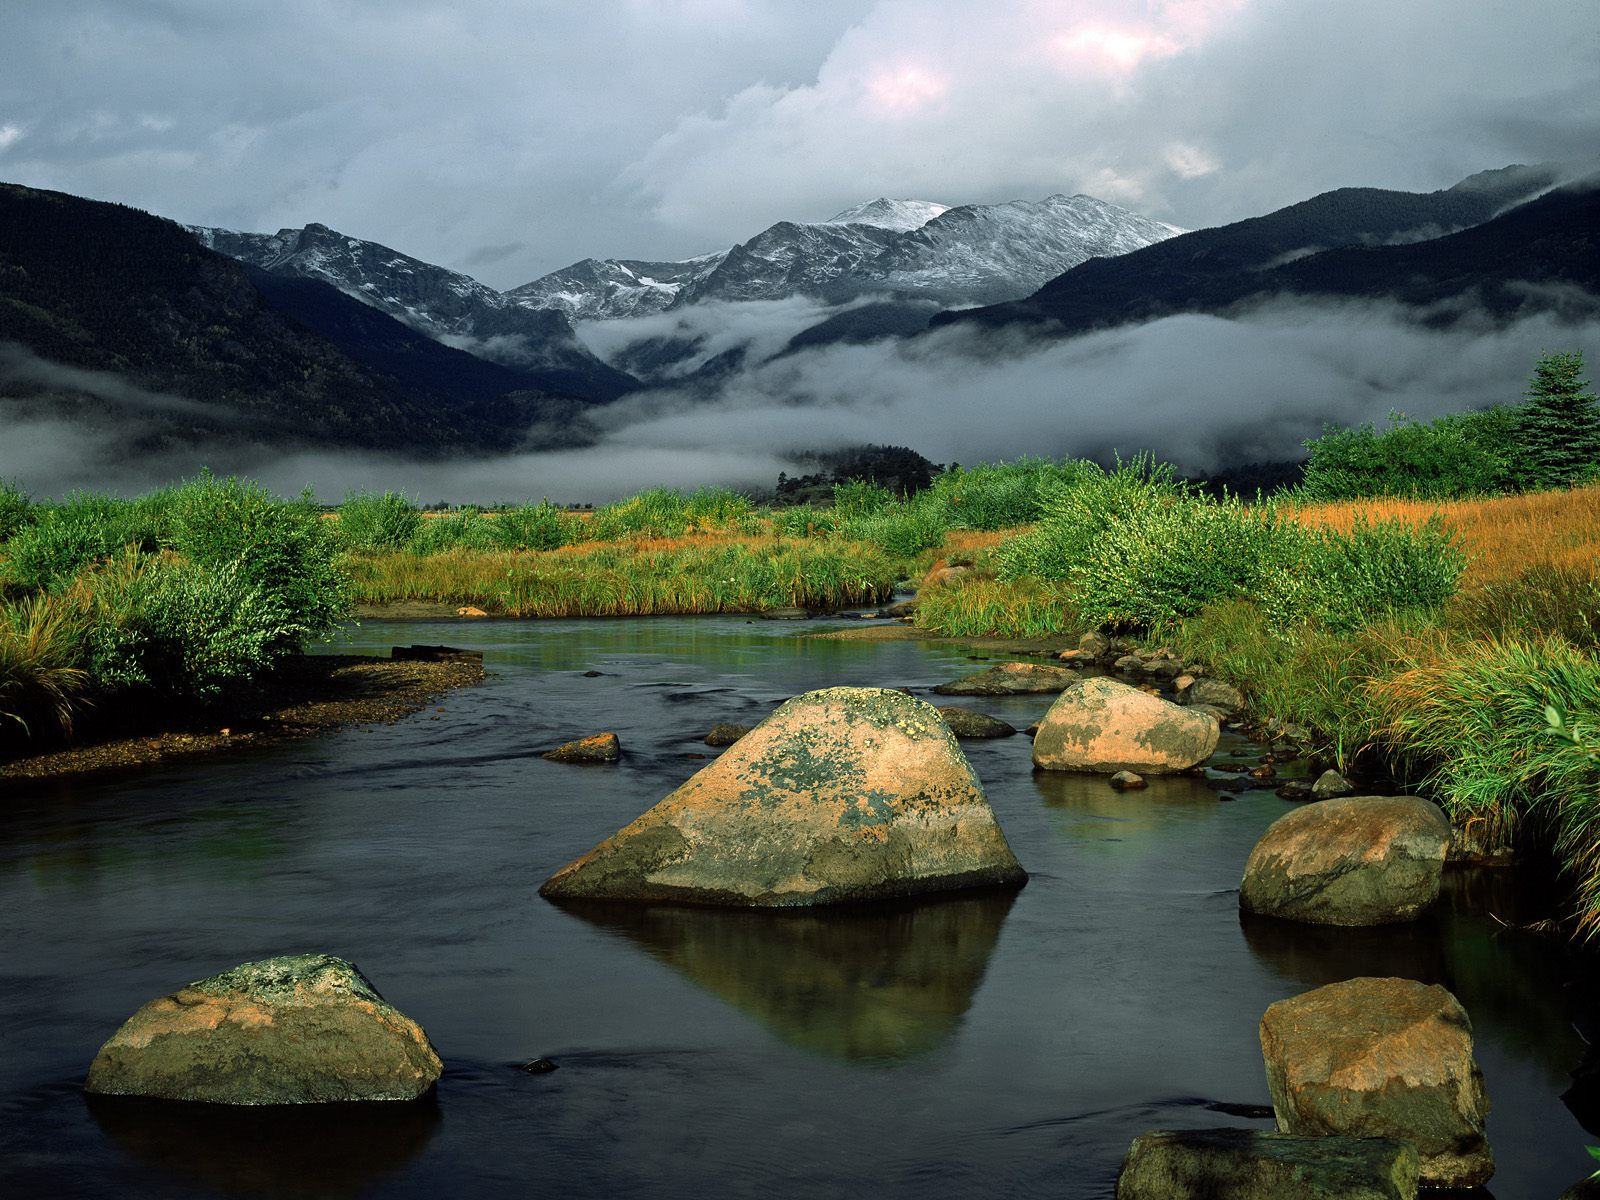 http://1.bp.blogspot.com/_ioD6UOQqcyA/Sw8AUQo6ZTI/AAAAAAAABhg/SRgtT6qRdKc/s1600/Sunrise+Light+on+Big+Thompson+River,+Rocky+Mountain+National+Park,+Colorado.jpg